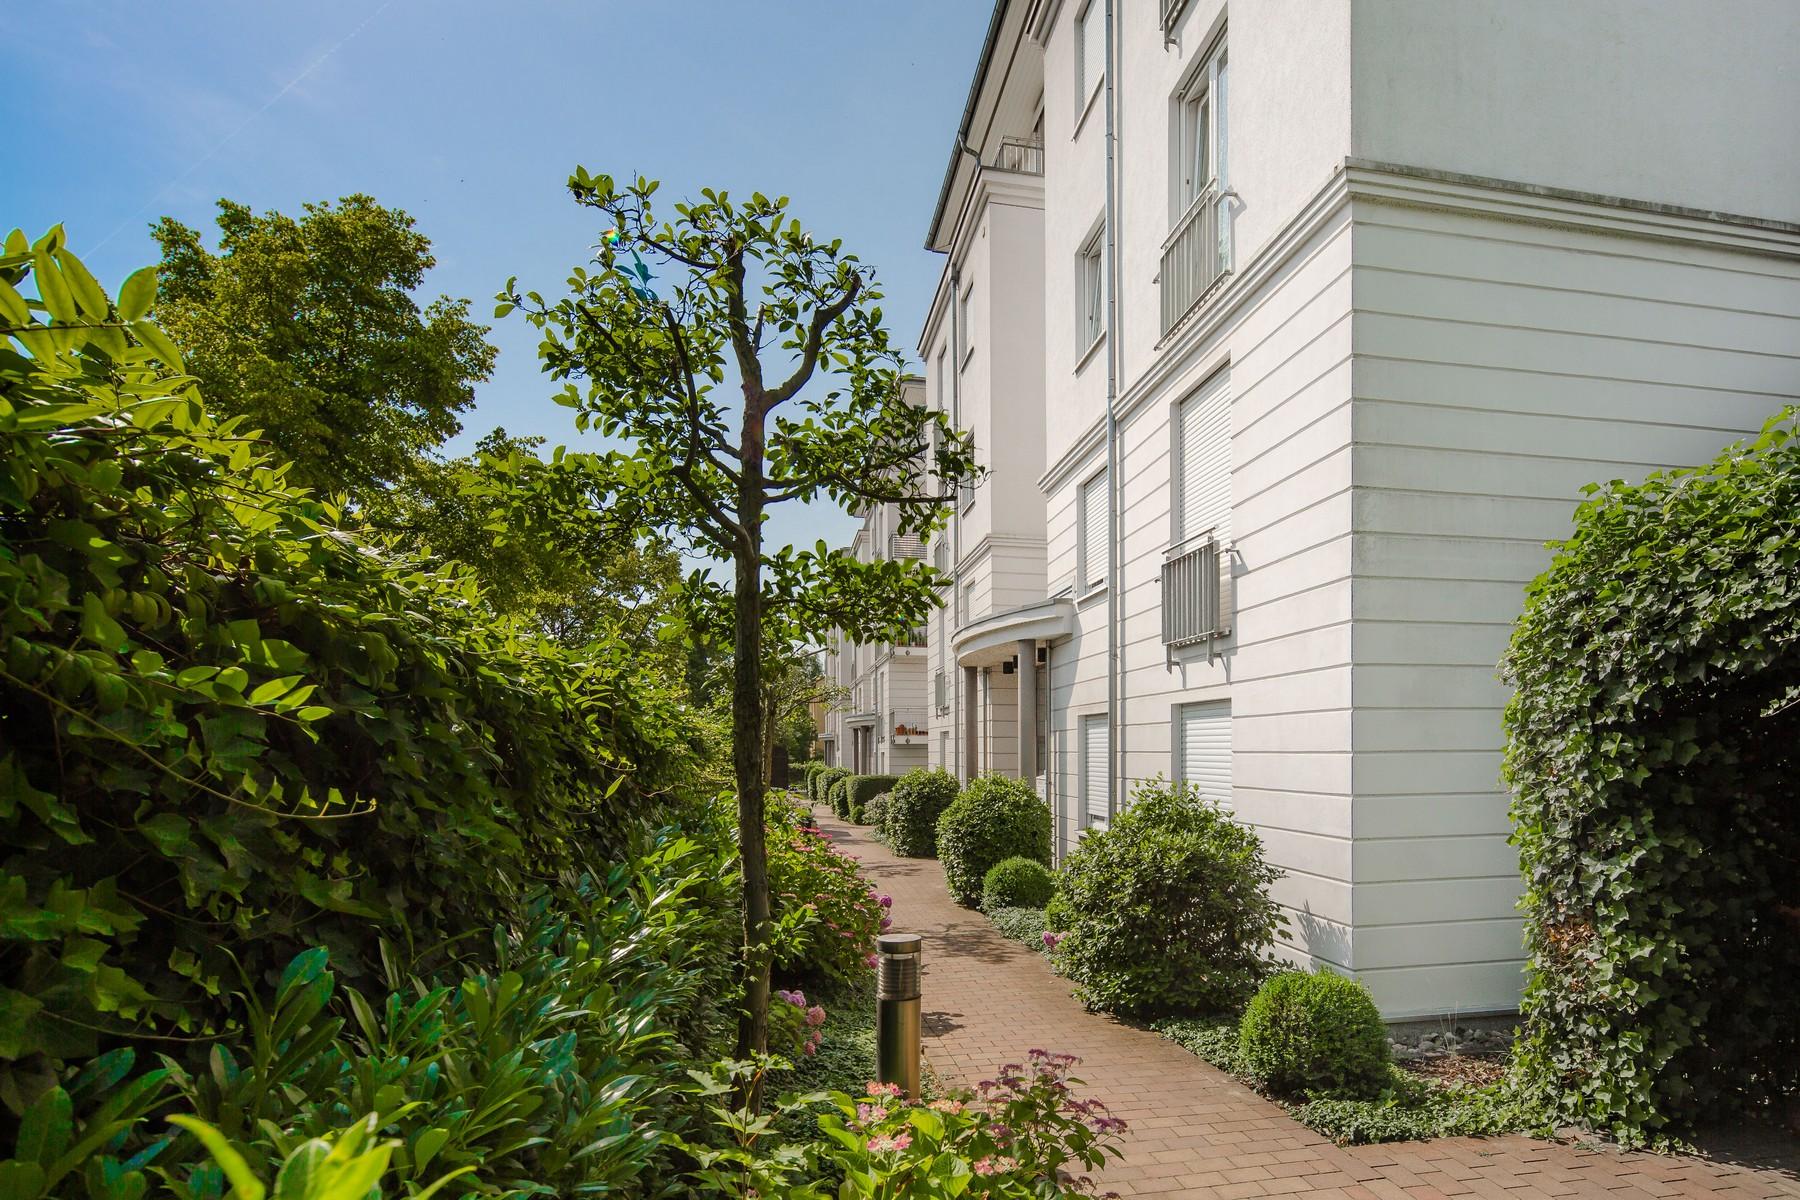 Appartement pour l Vente à Enlarged Zone of Comfort - Penthouse Frankfurt, Hesse, 60433 Allemagne